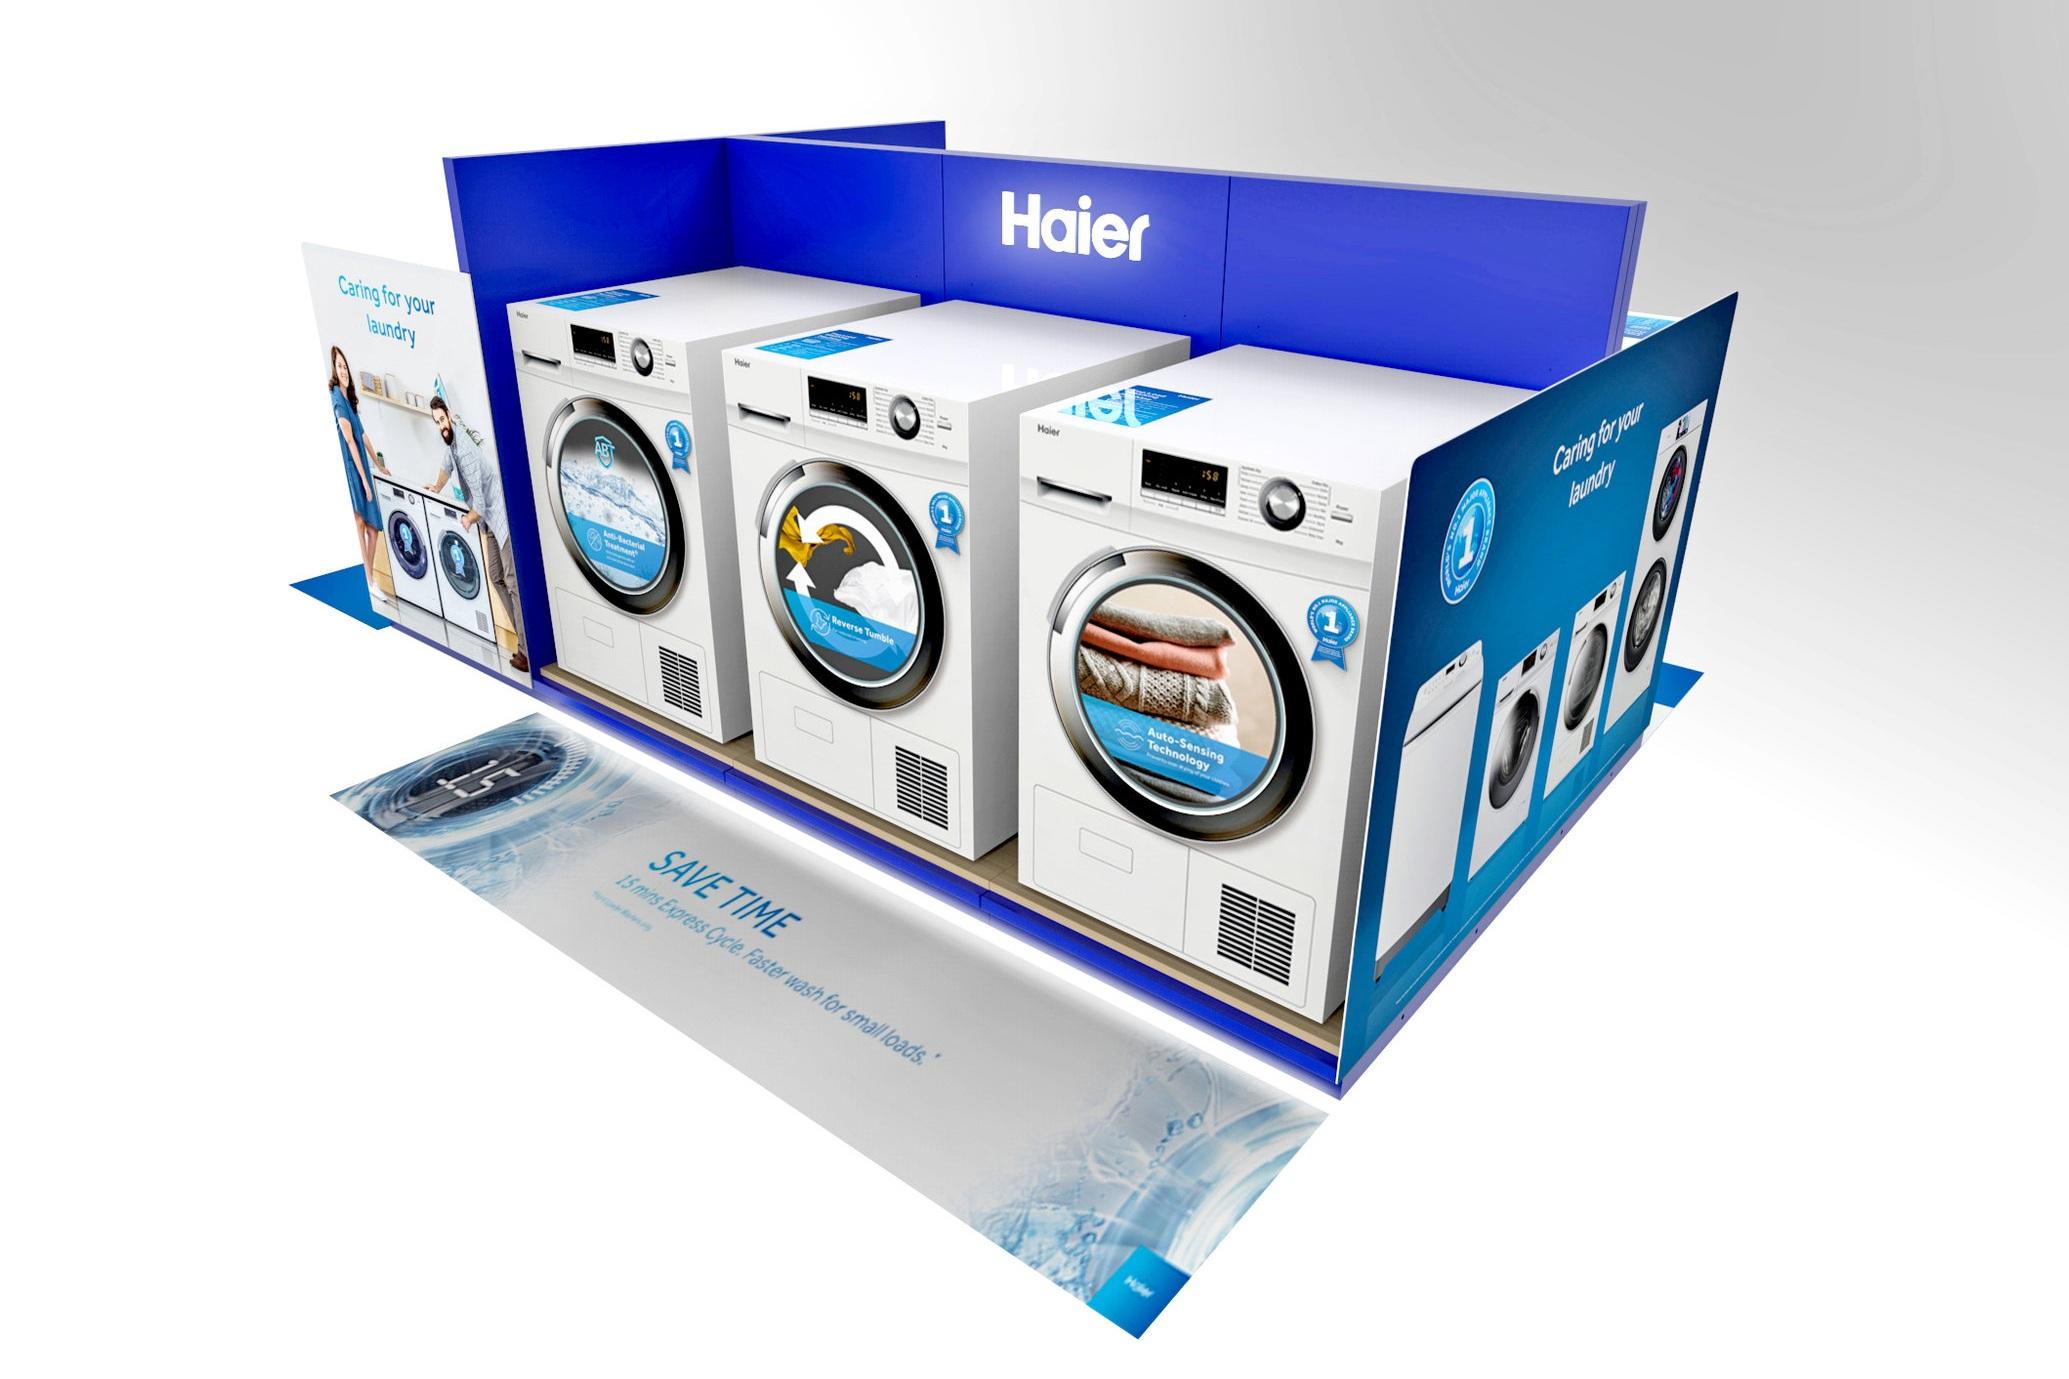 HAI006_laundry+Final+Design_01111.33.jpg